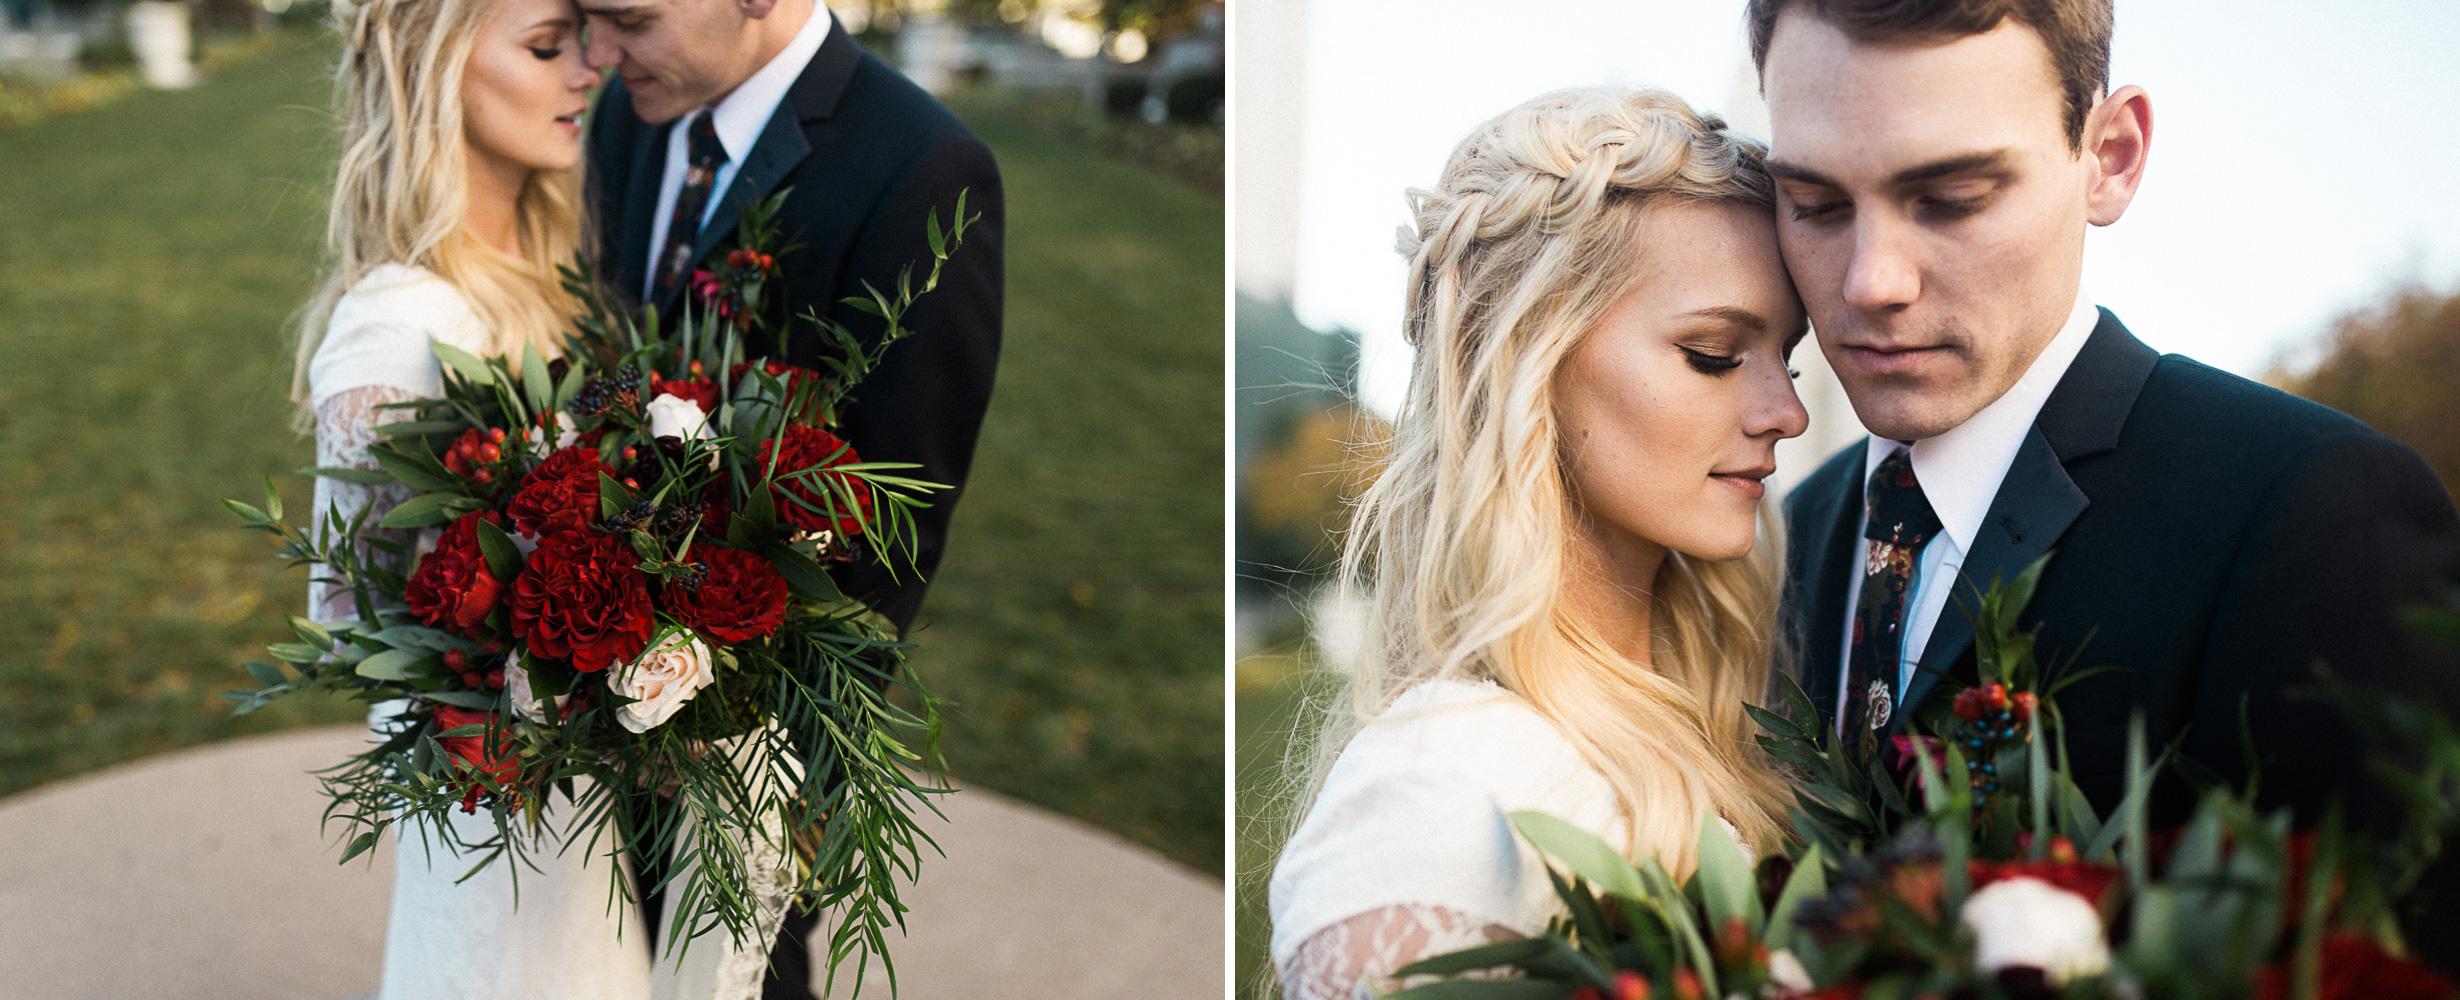 Salt-Lake-City-Temple-Wedding-Photographer-01.jpg